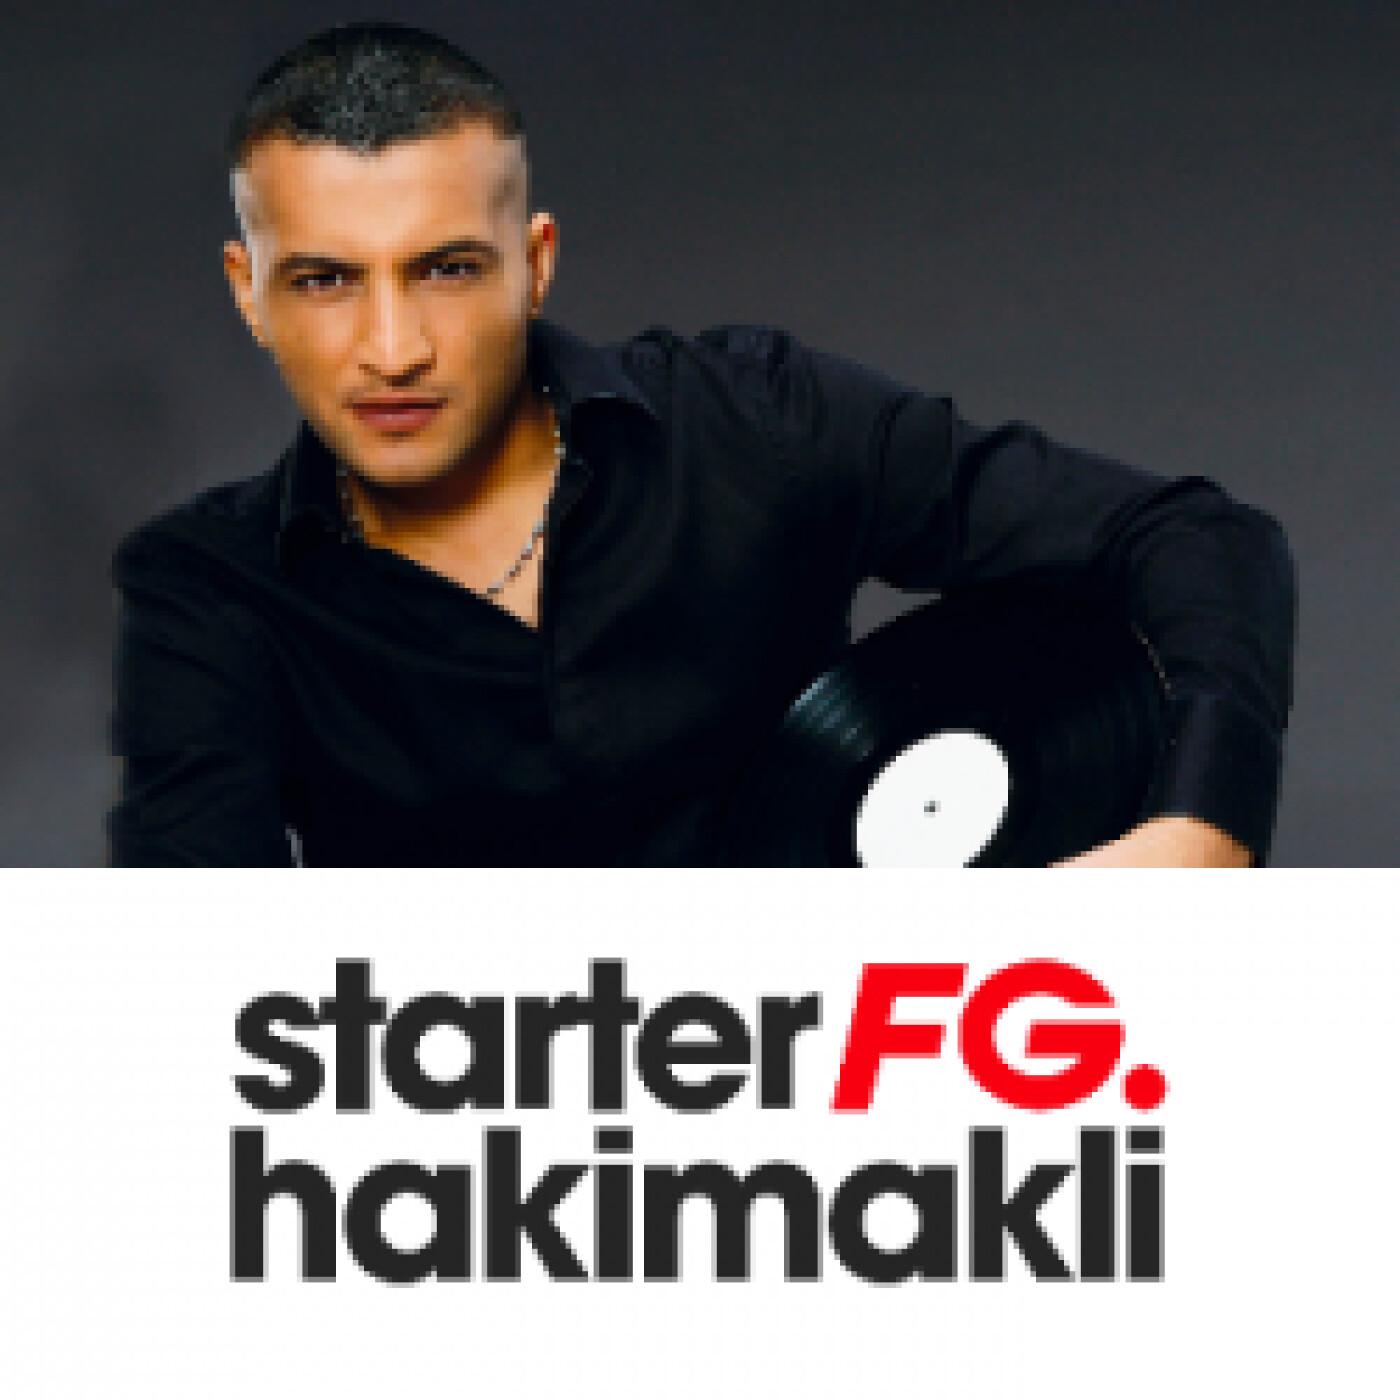 STARTER FG BY HAKIMAKLI JEUDI 4 MARS 2021